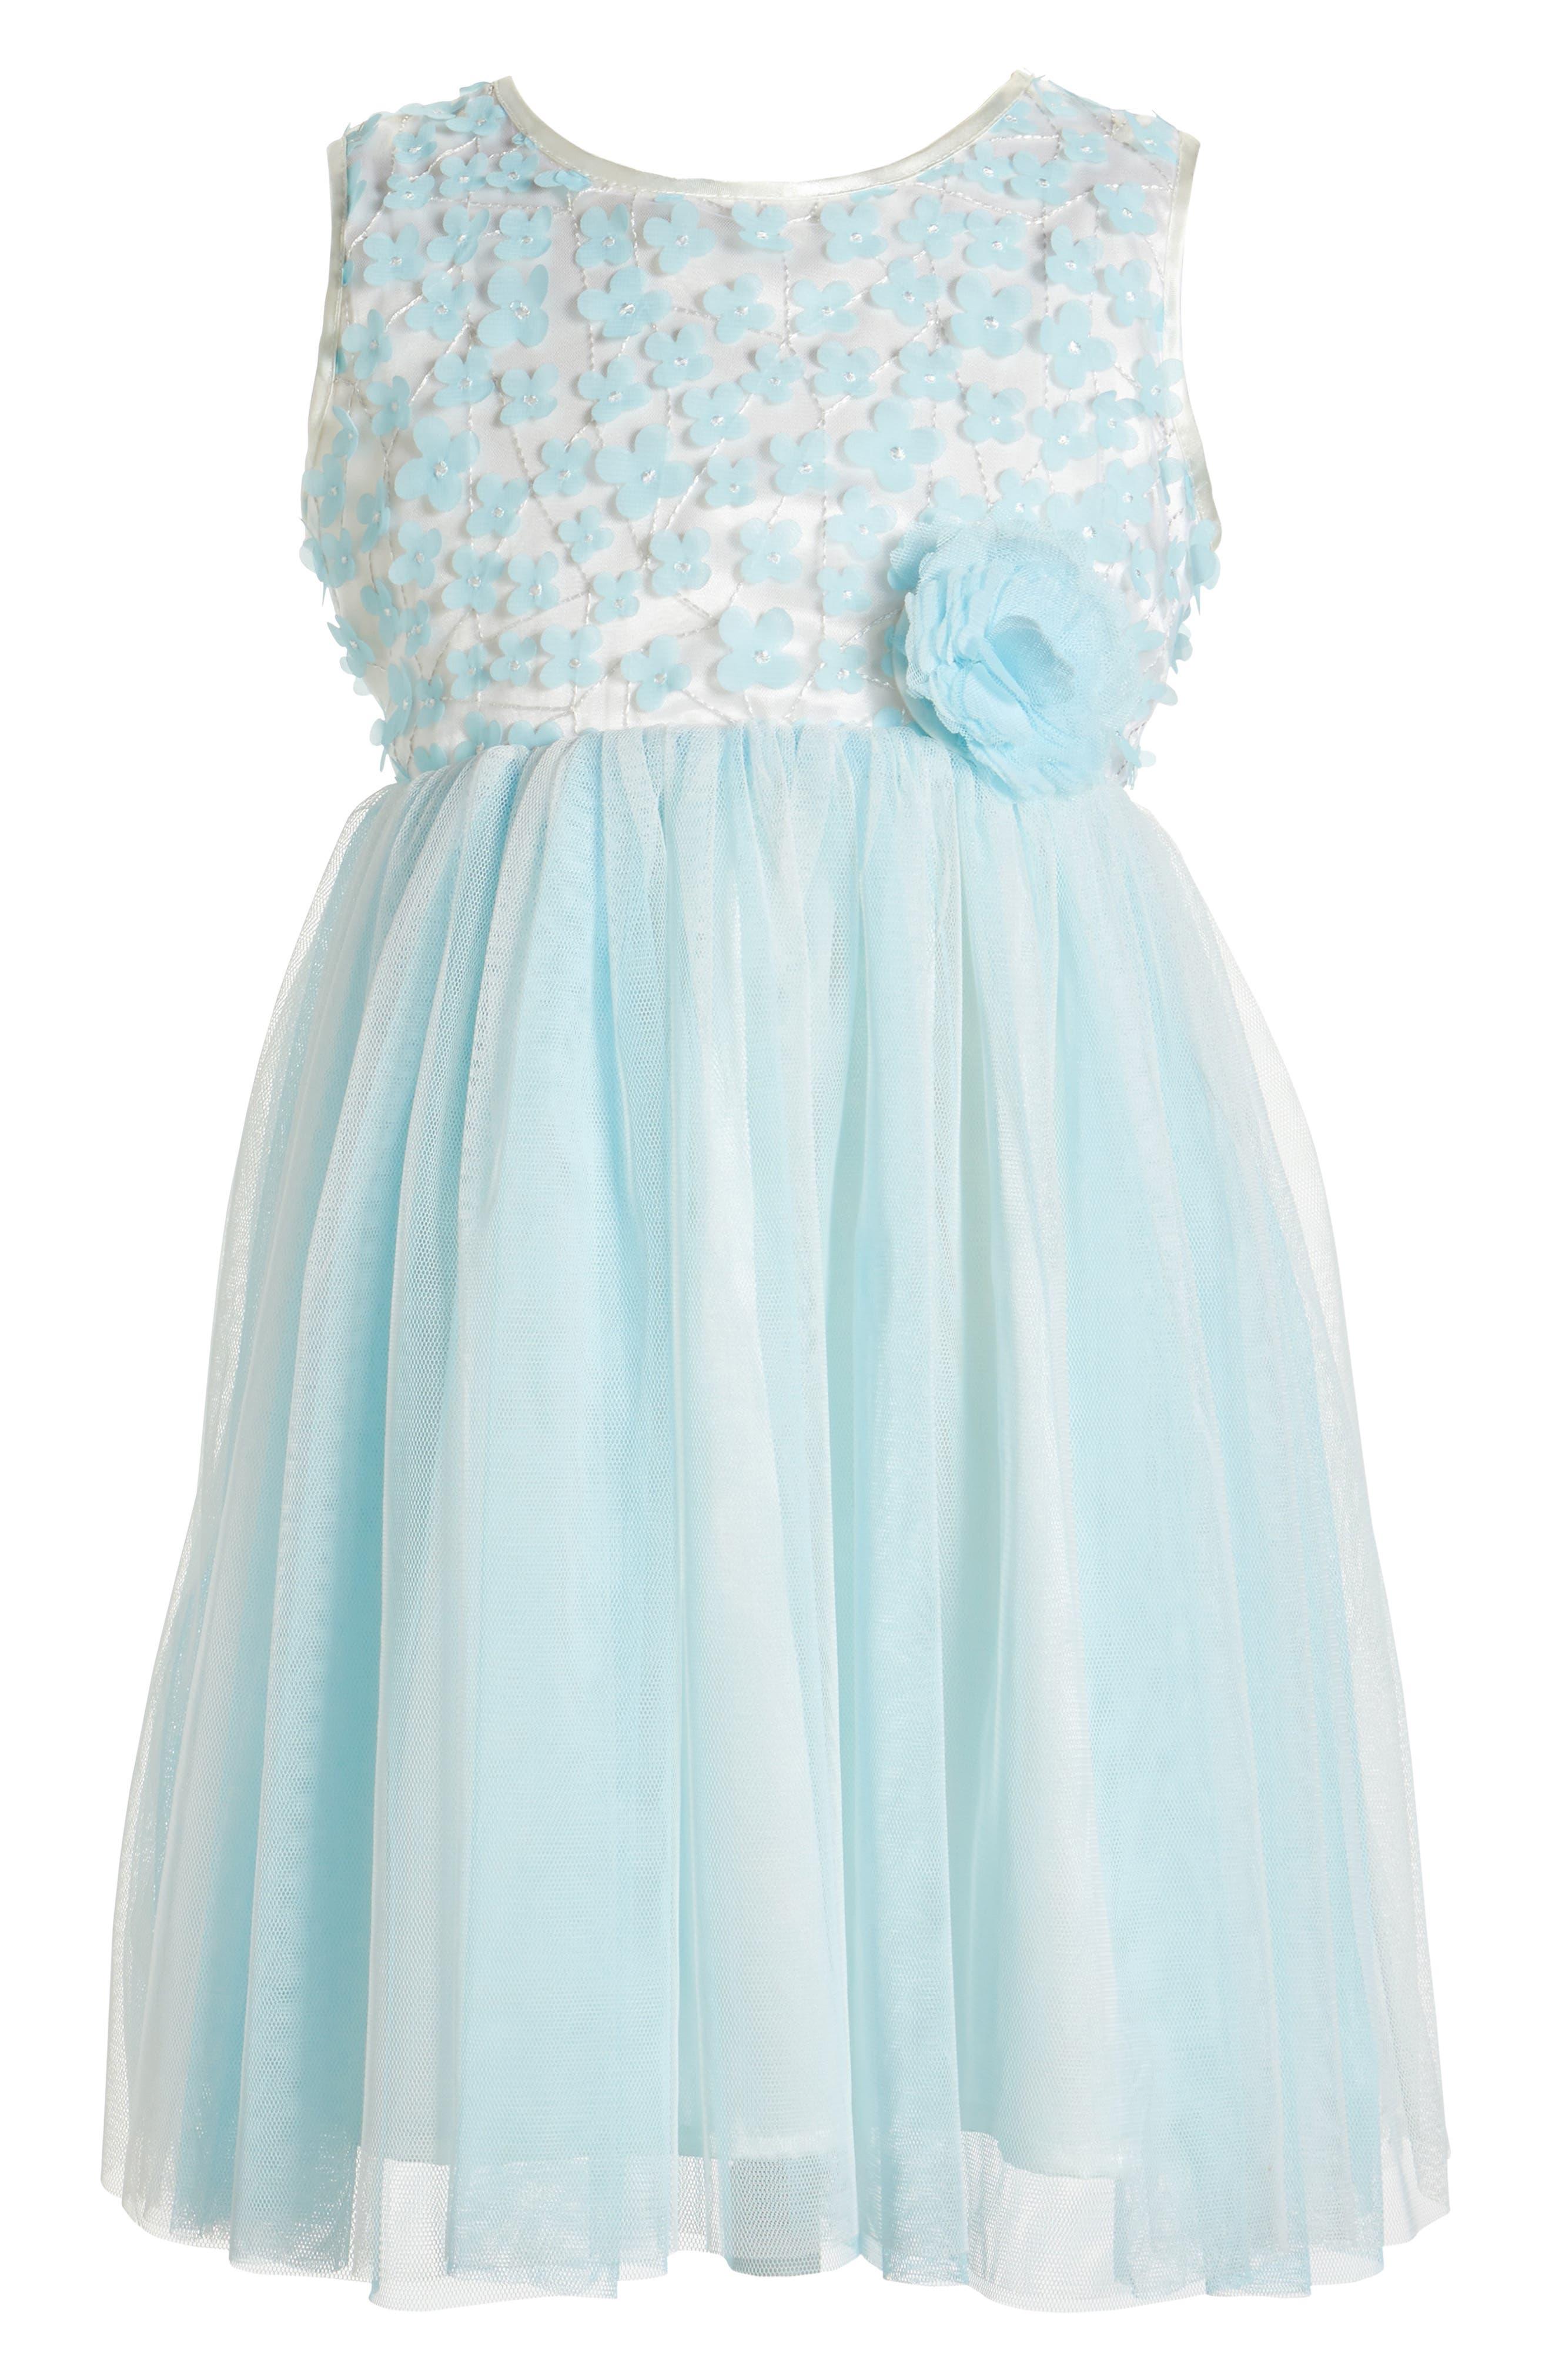 Sleeveless Floral Dress,                         Main,                         color, BLUE